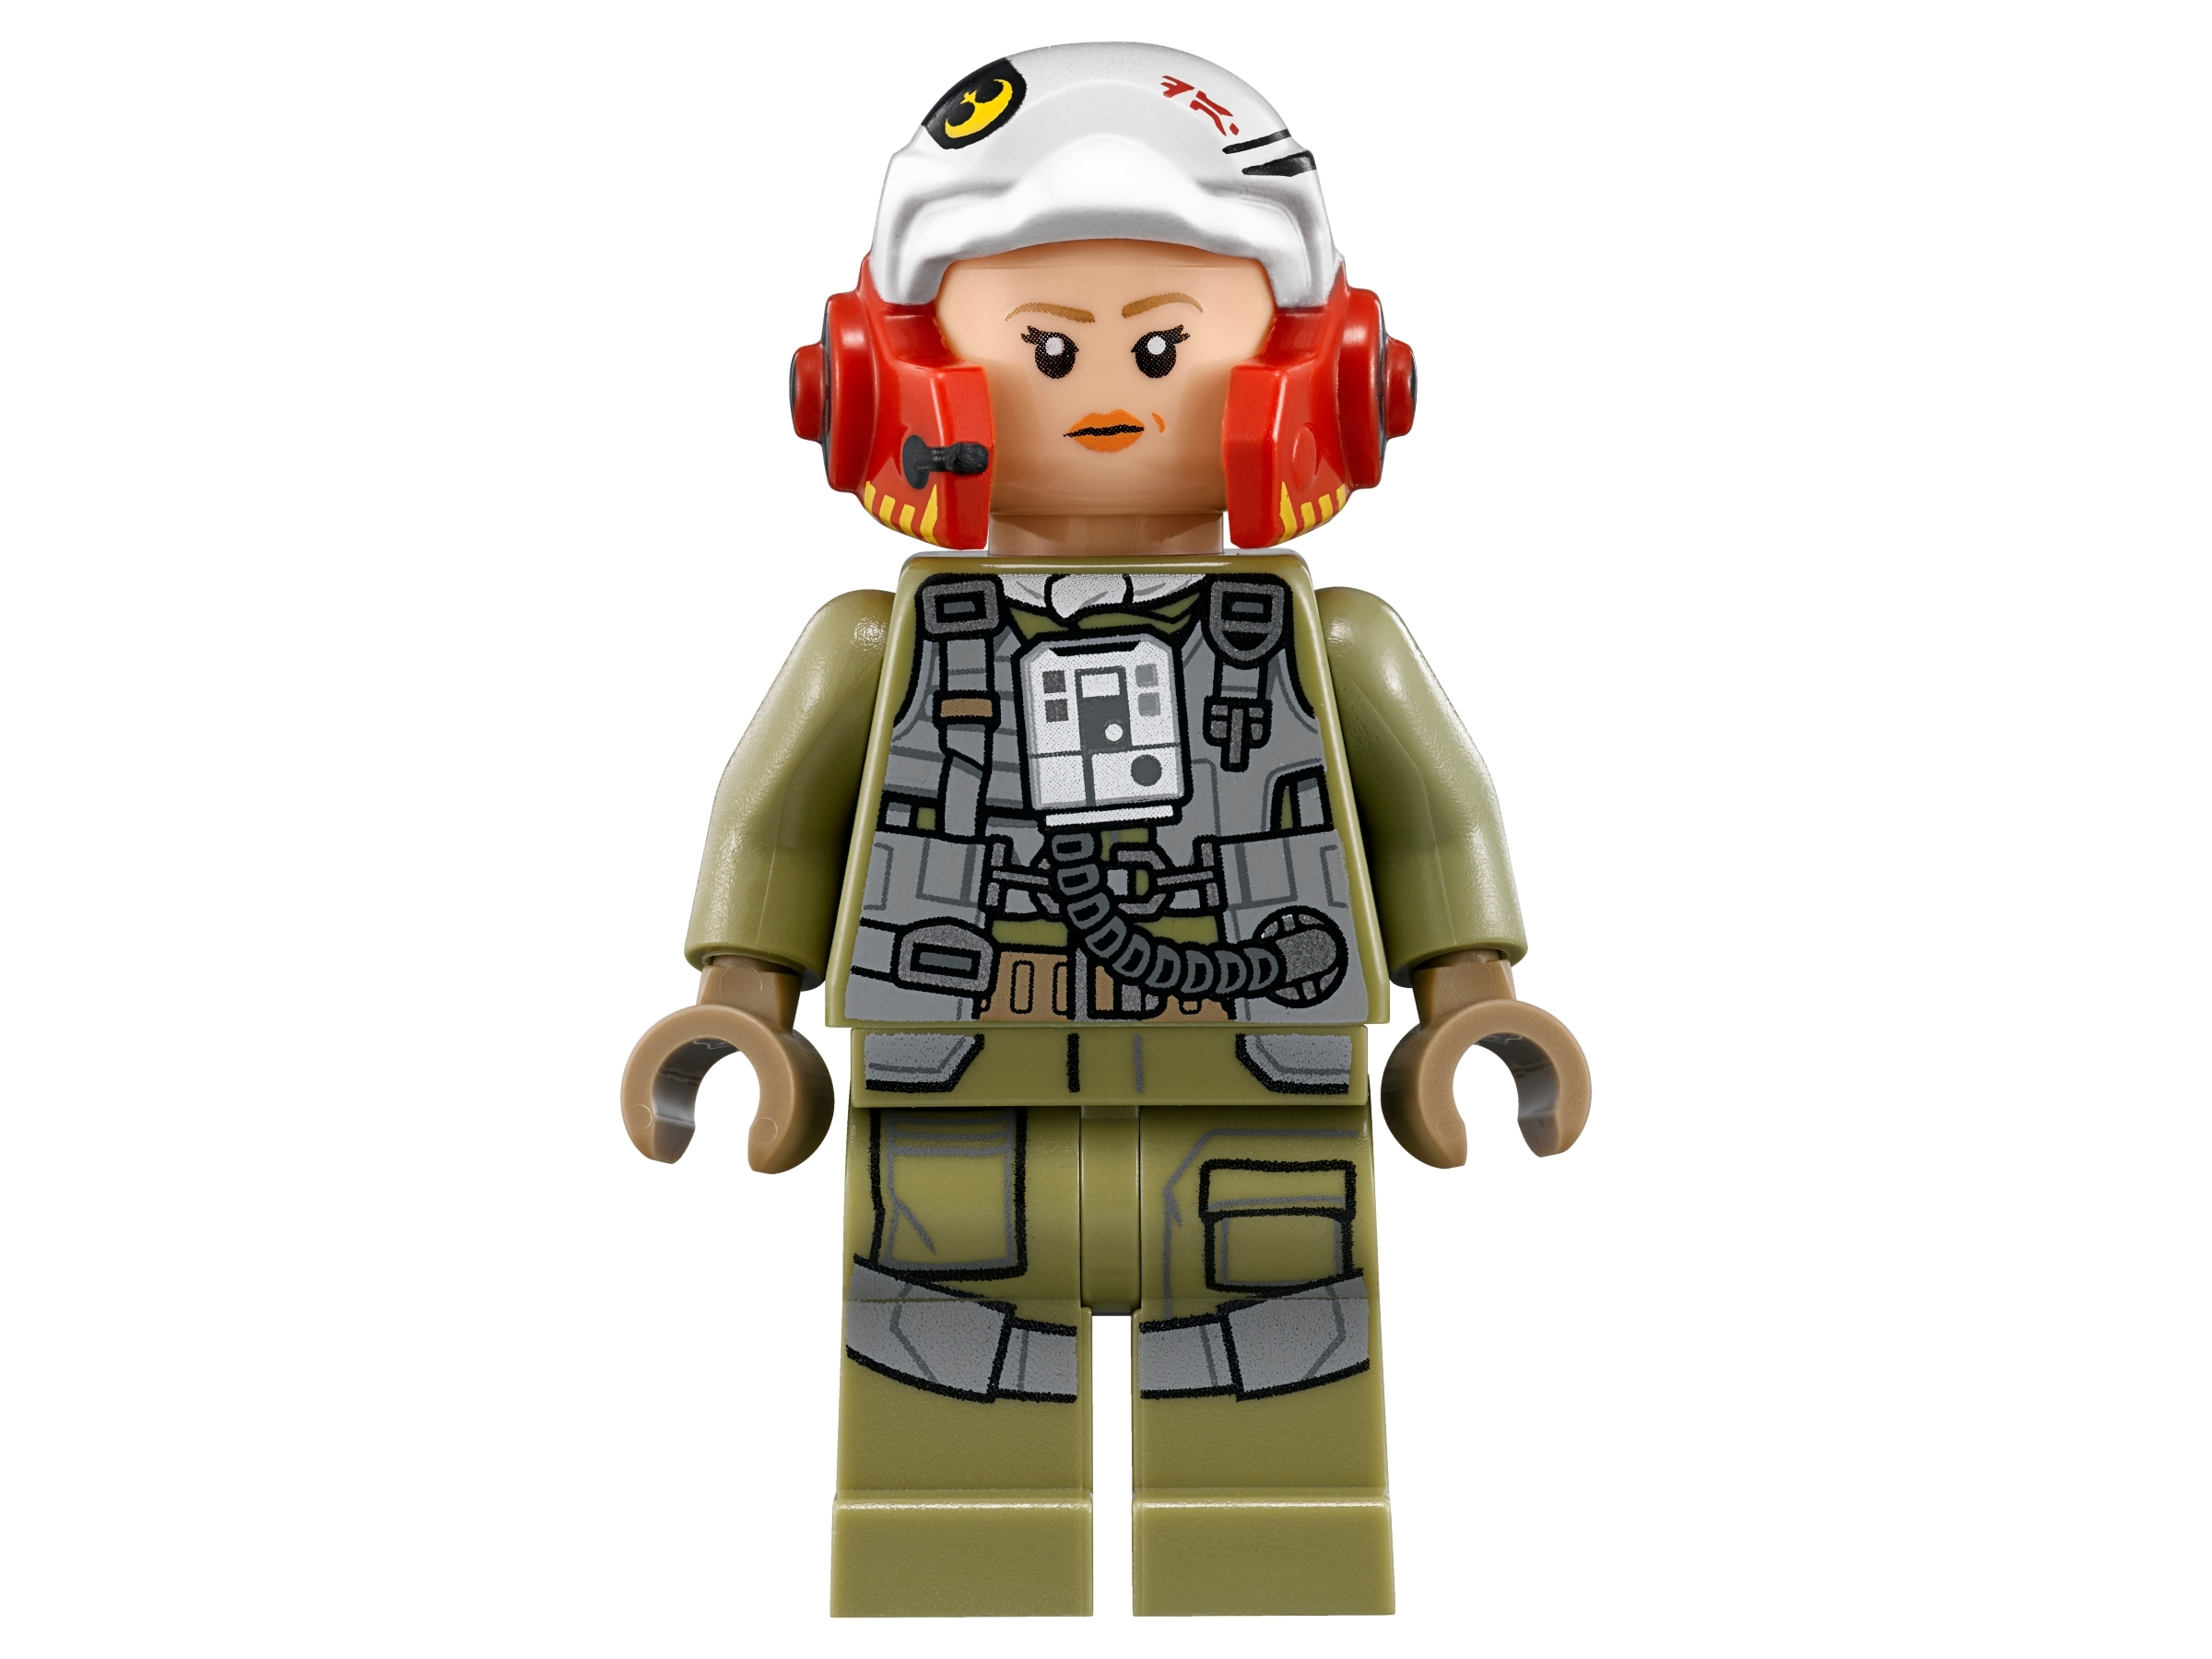 Lightsaber 75196 Minifigure A-Wing vs TIE Silencer LEGO NEW Star Wars Kylo Ren